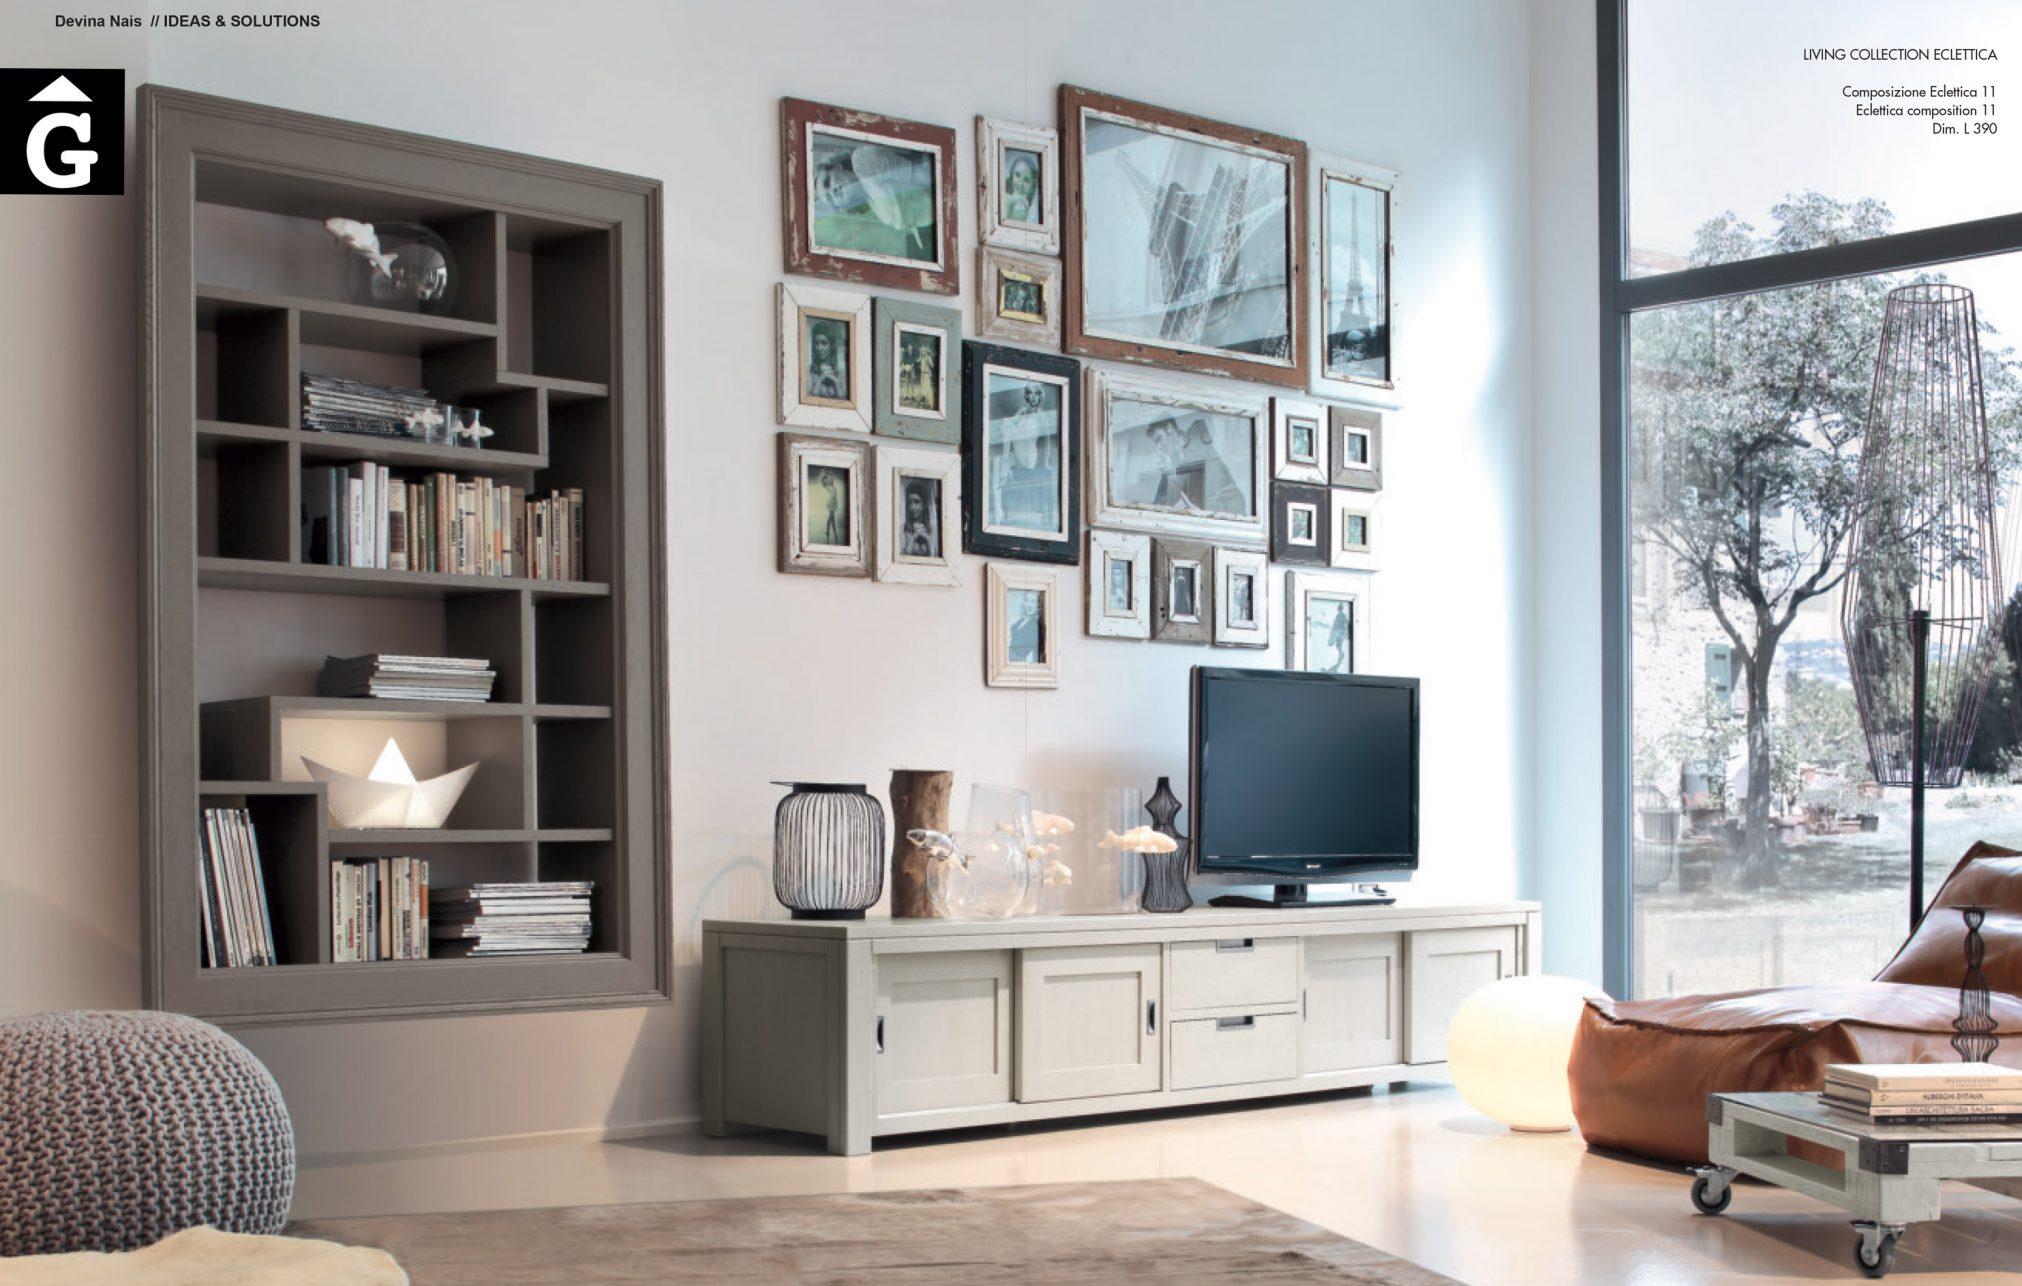 Moble TV Eclettica roure massís pintat Devina Nais V2 by mobles Gifreu